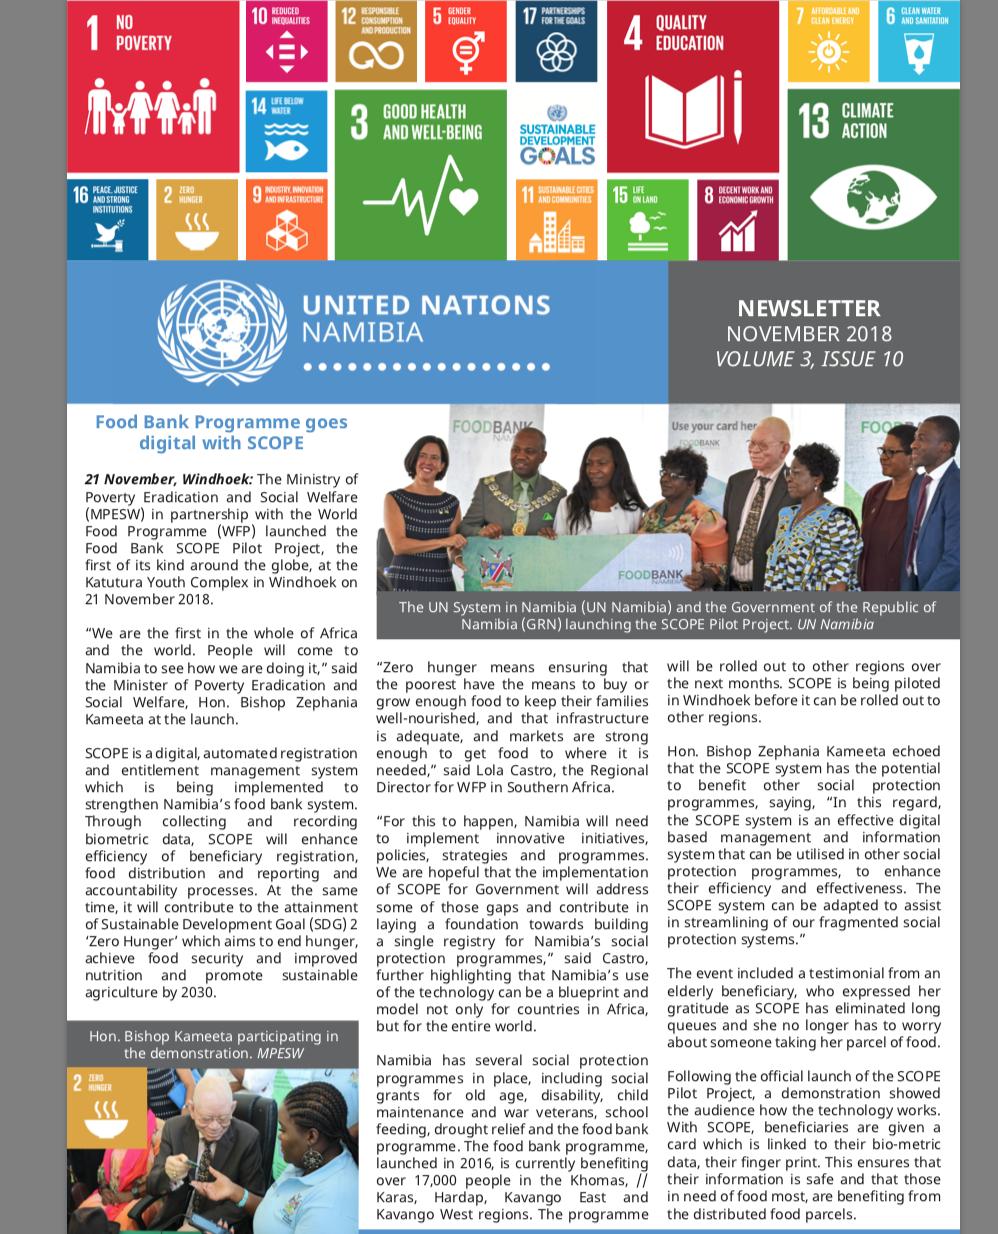 UN Namibia Newsletter- November 2018, Volume 3 Issue 10